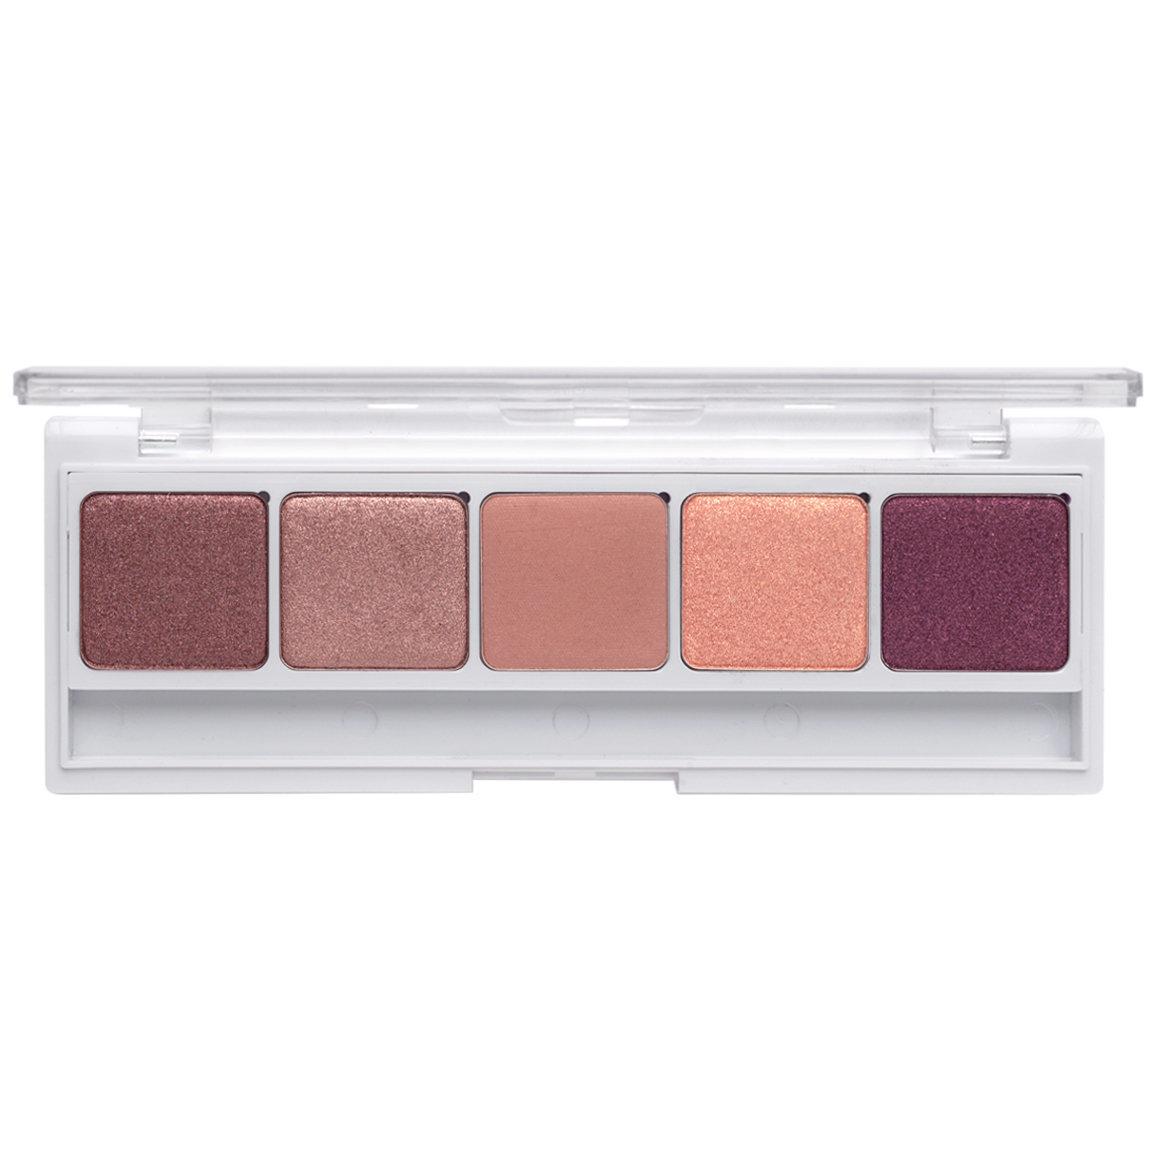 Natasha Denona Eyeshadow Palette 5 Palette 02 product swatch.